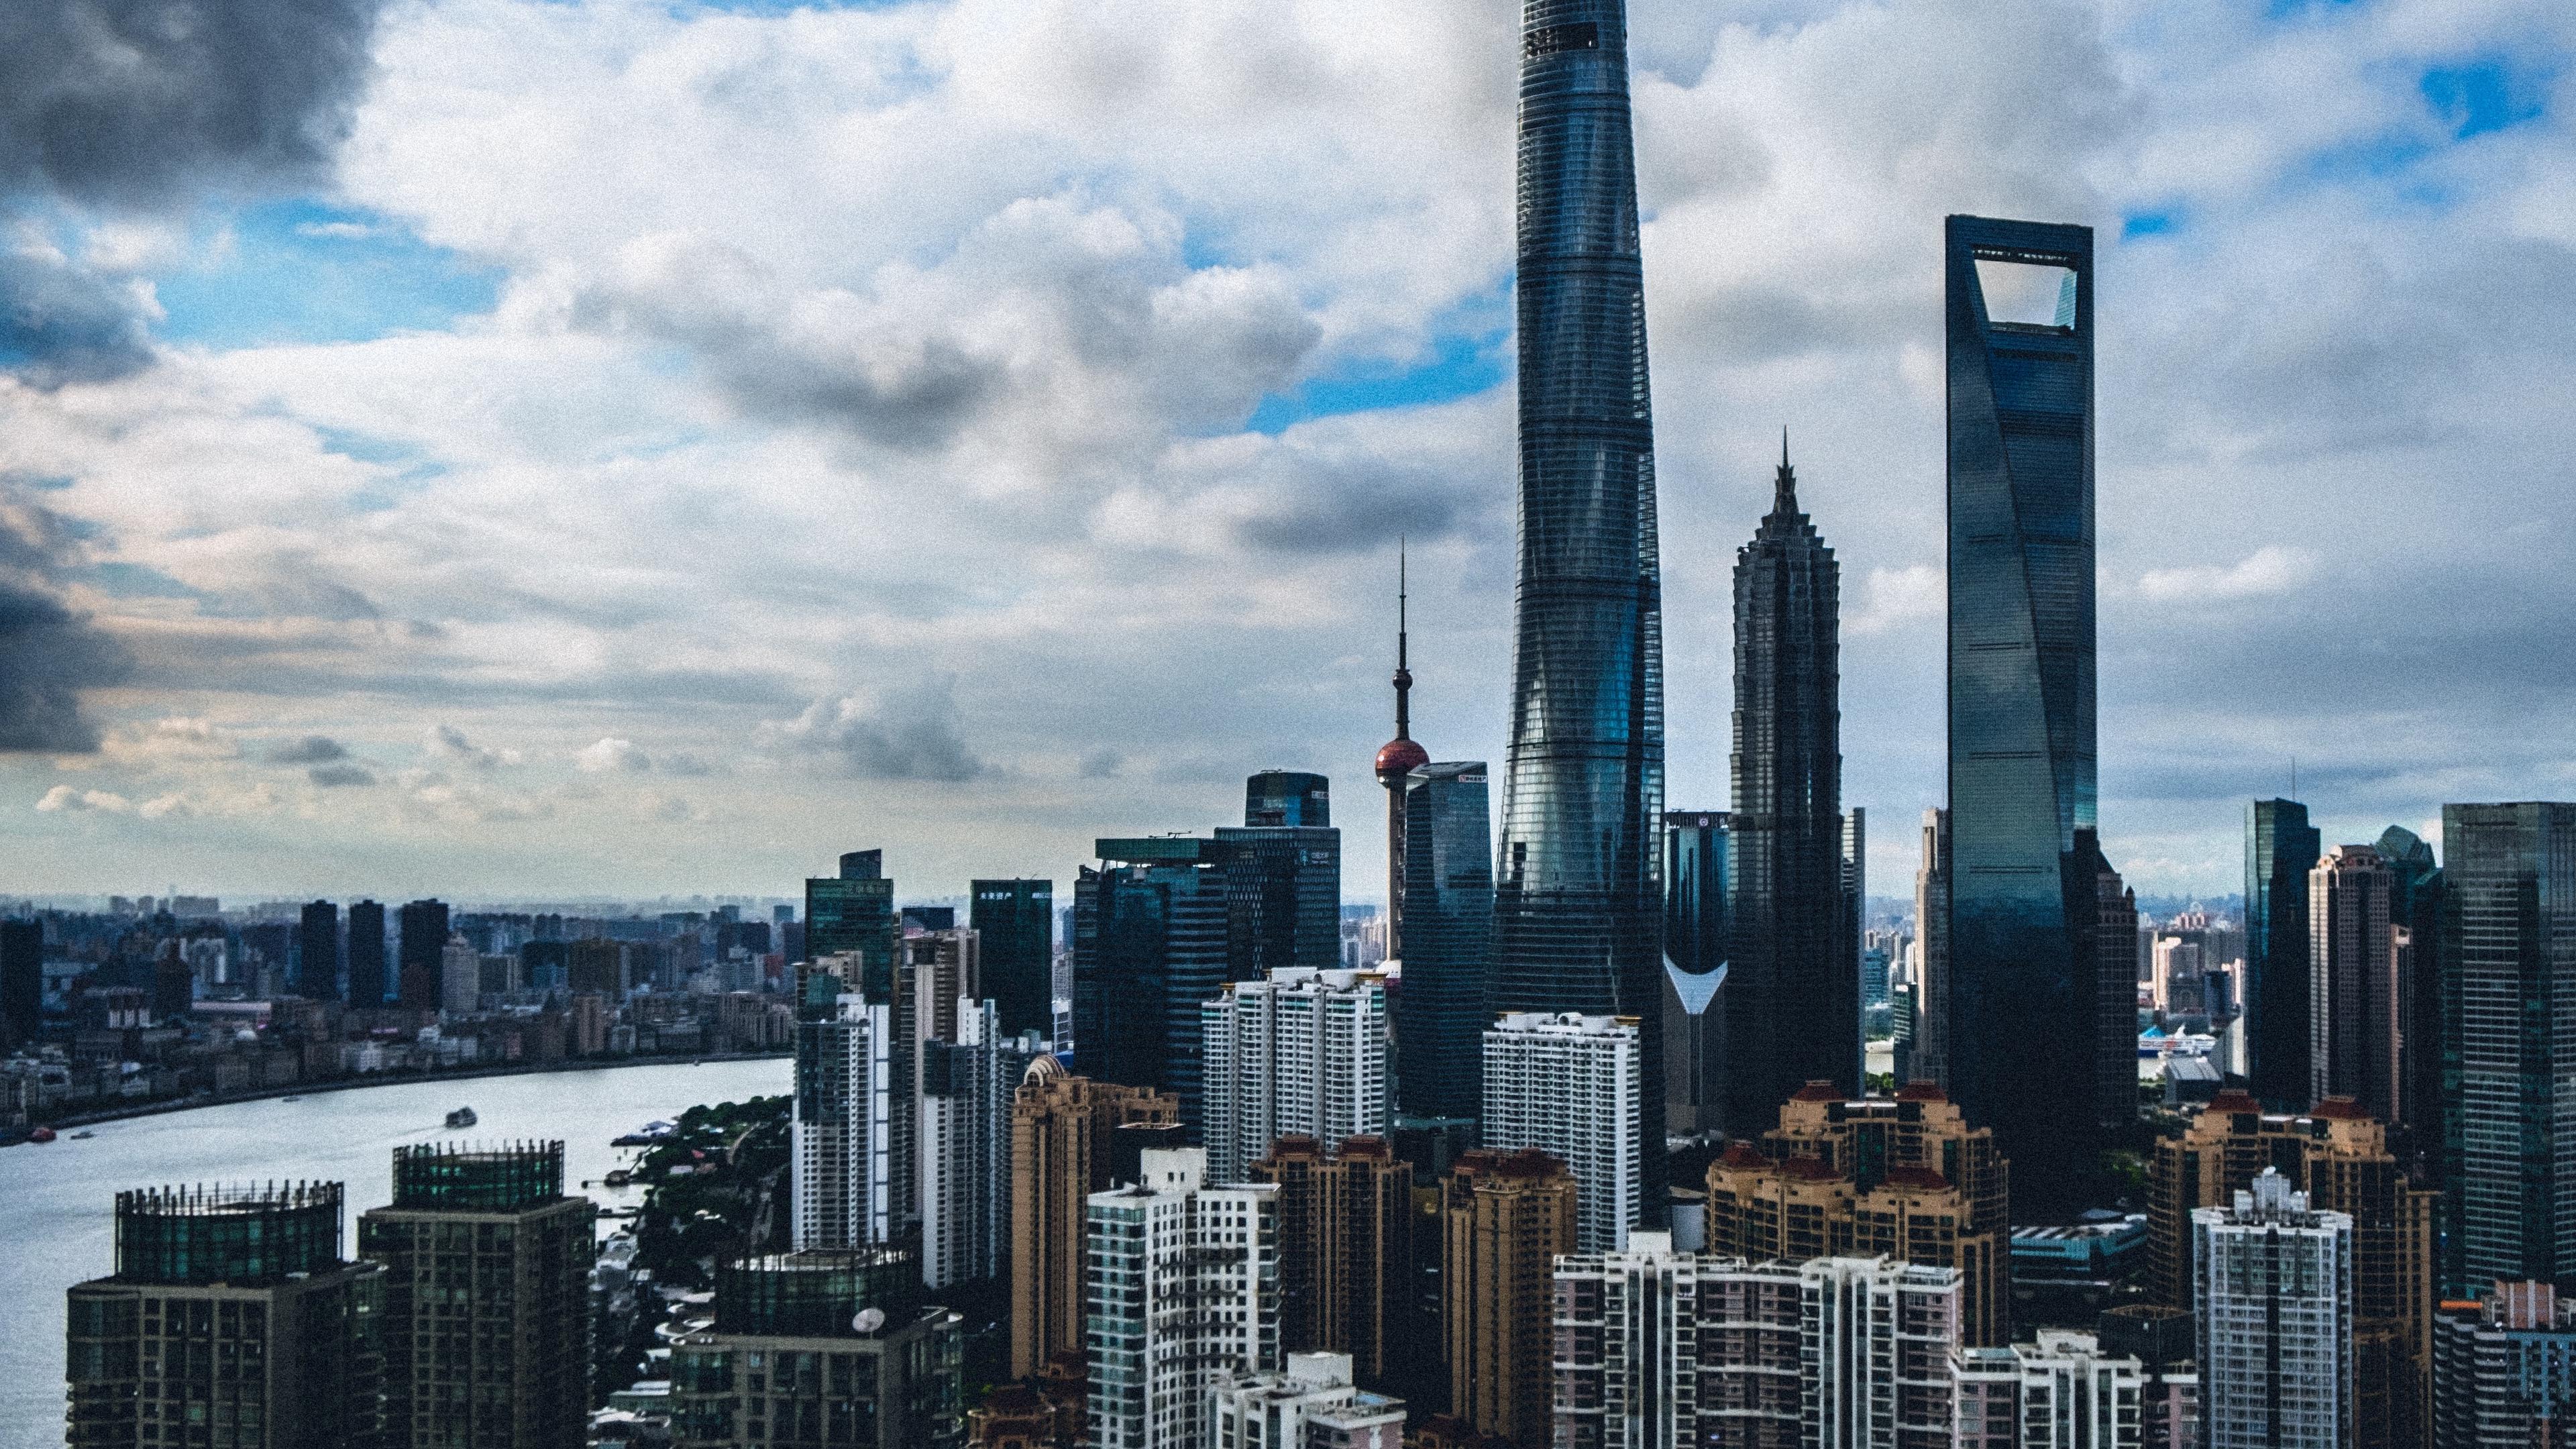 shanghai china skyscrapers buildings 4k 1538064889 - shanghai, china, skyscrapers, buildings 4k - Skyscrapers, Shanghai, China